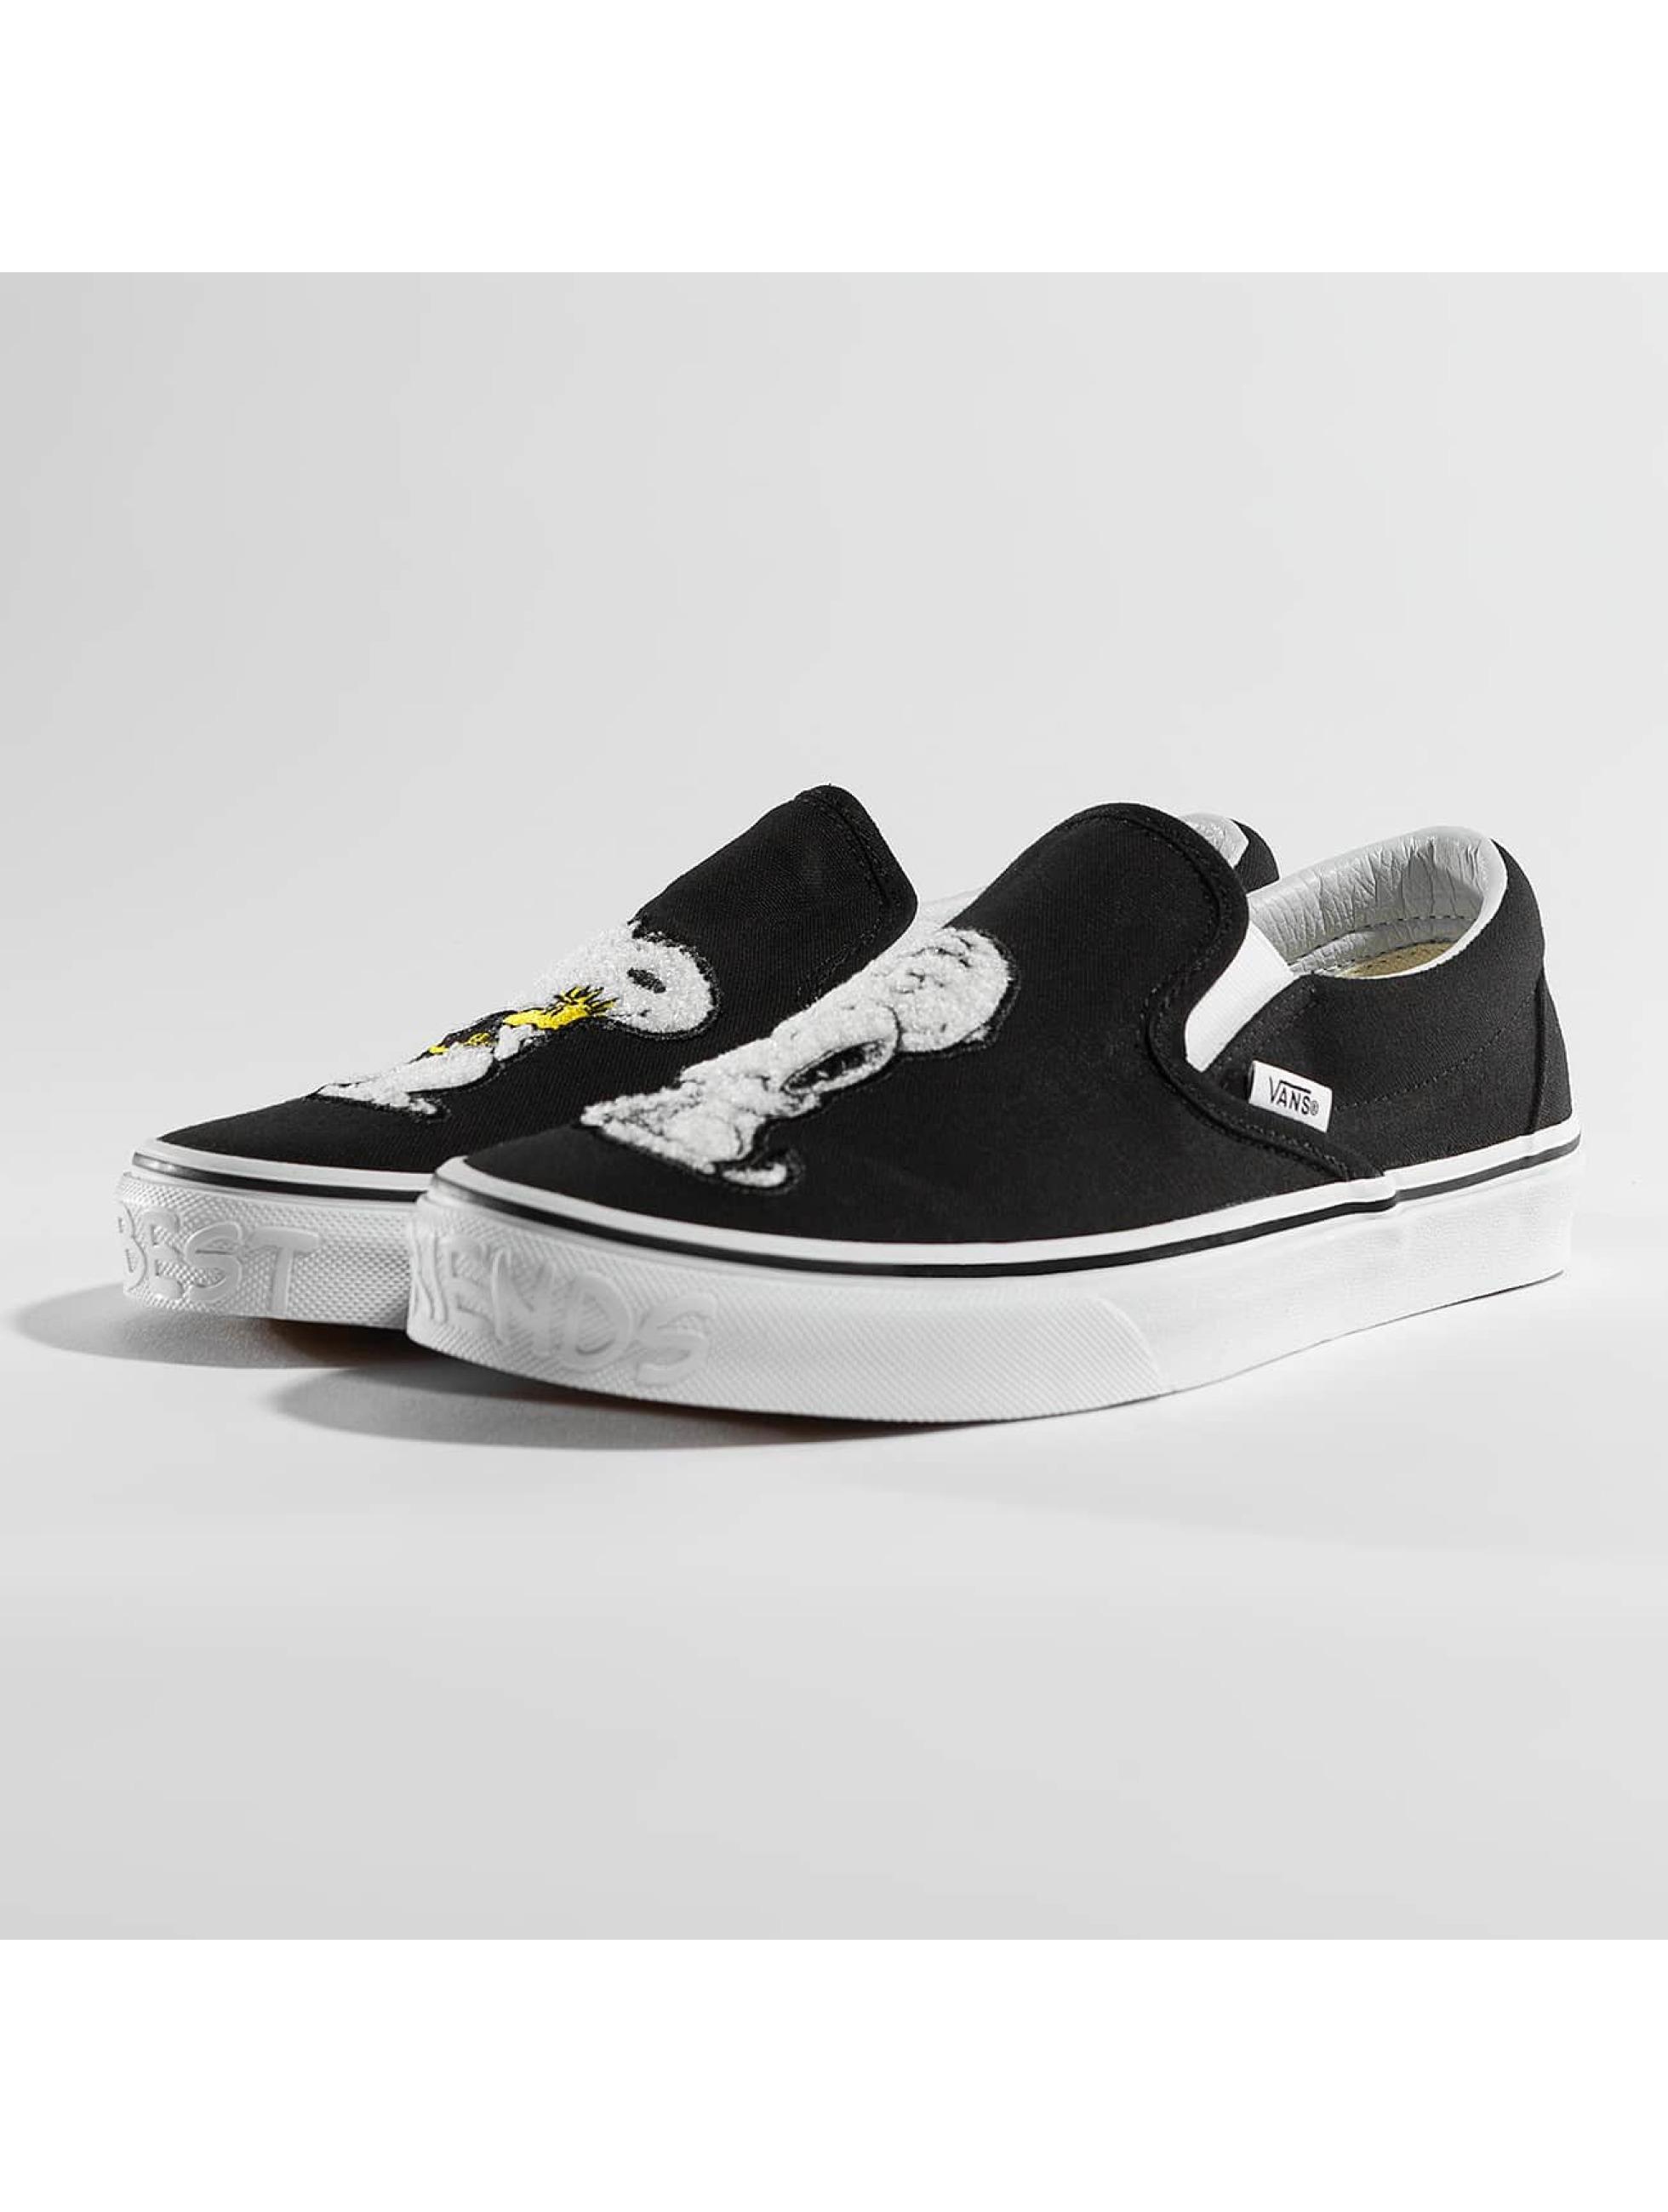 Vans Sneakers Peanuts Classic Slip On czarny